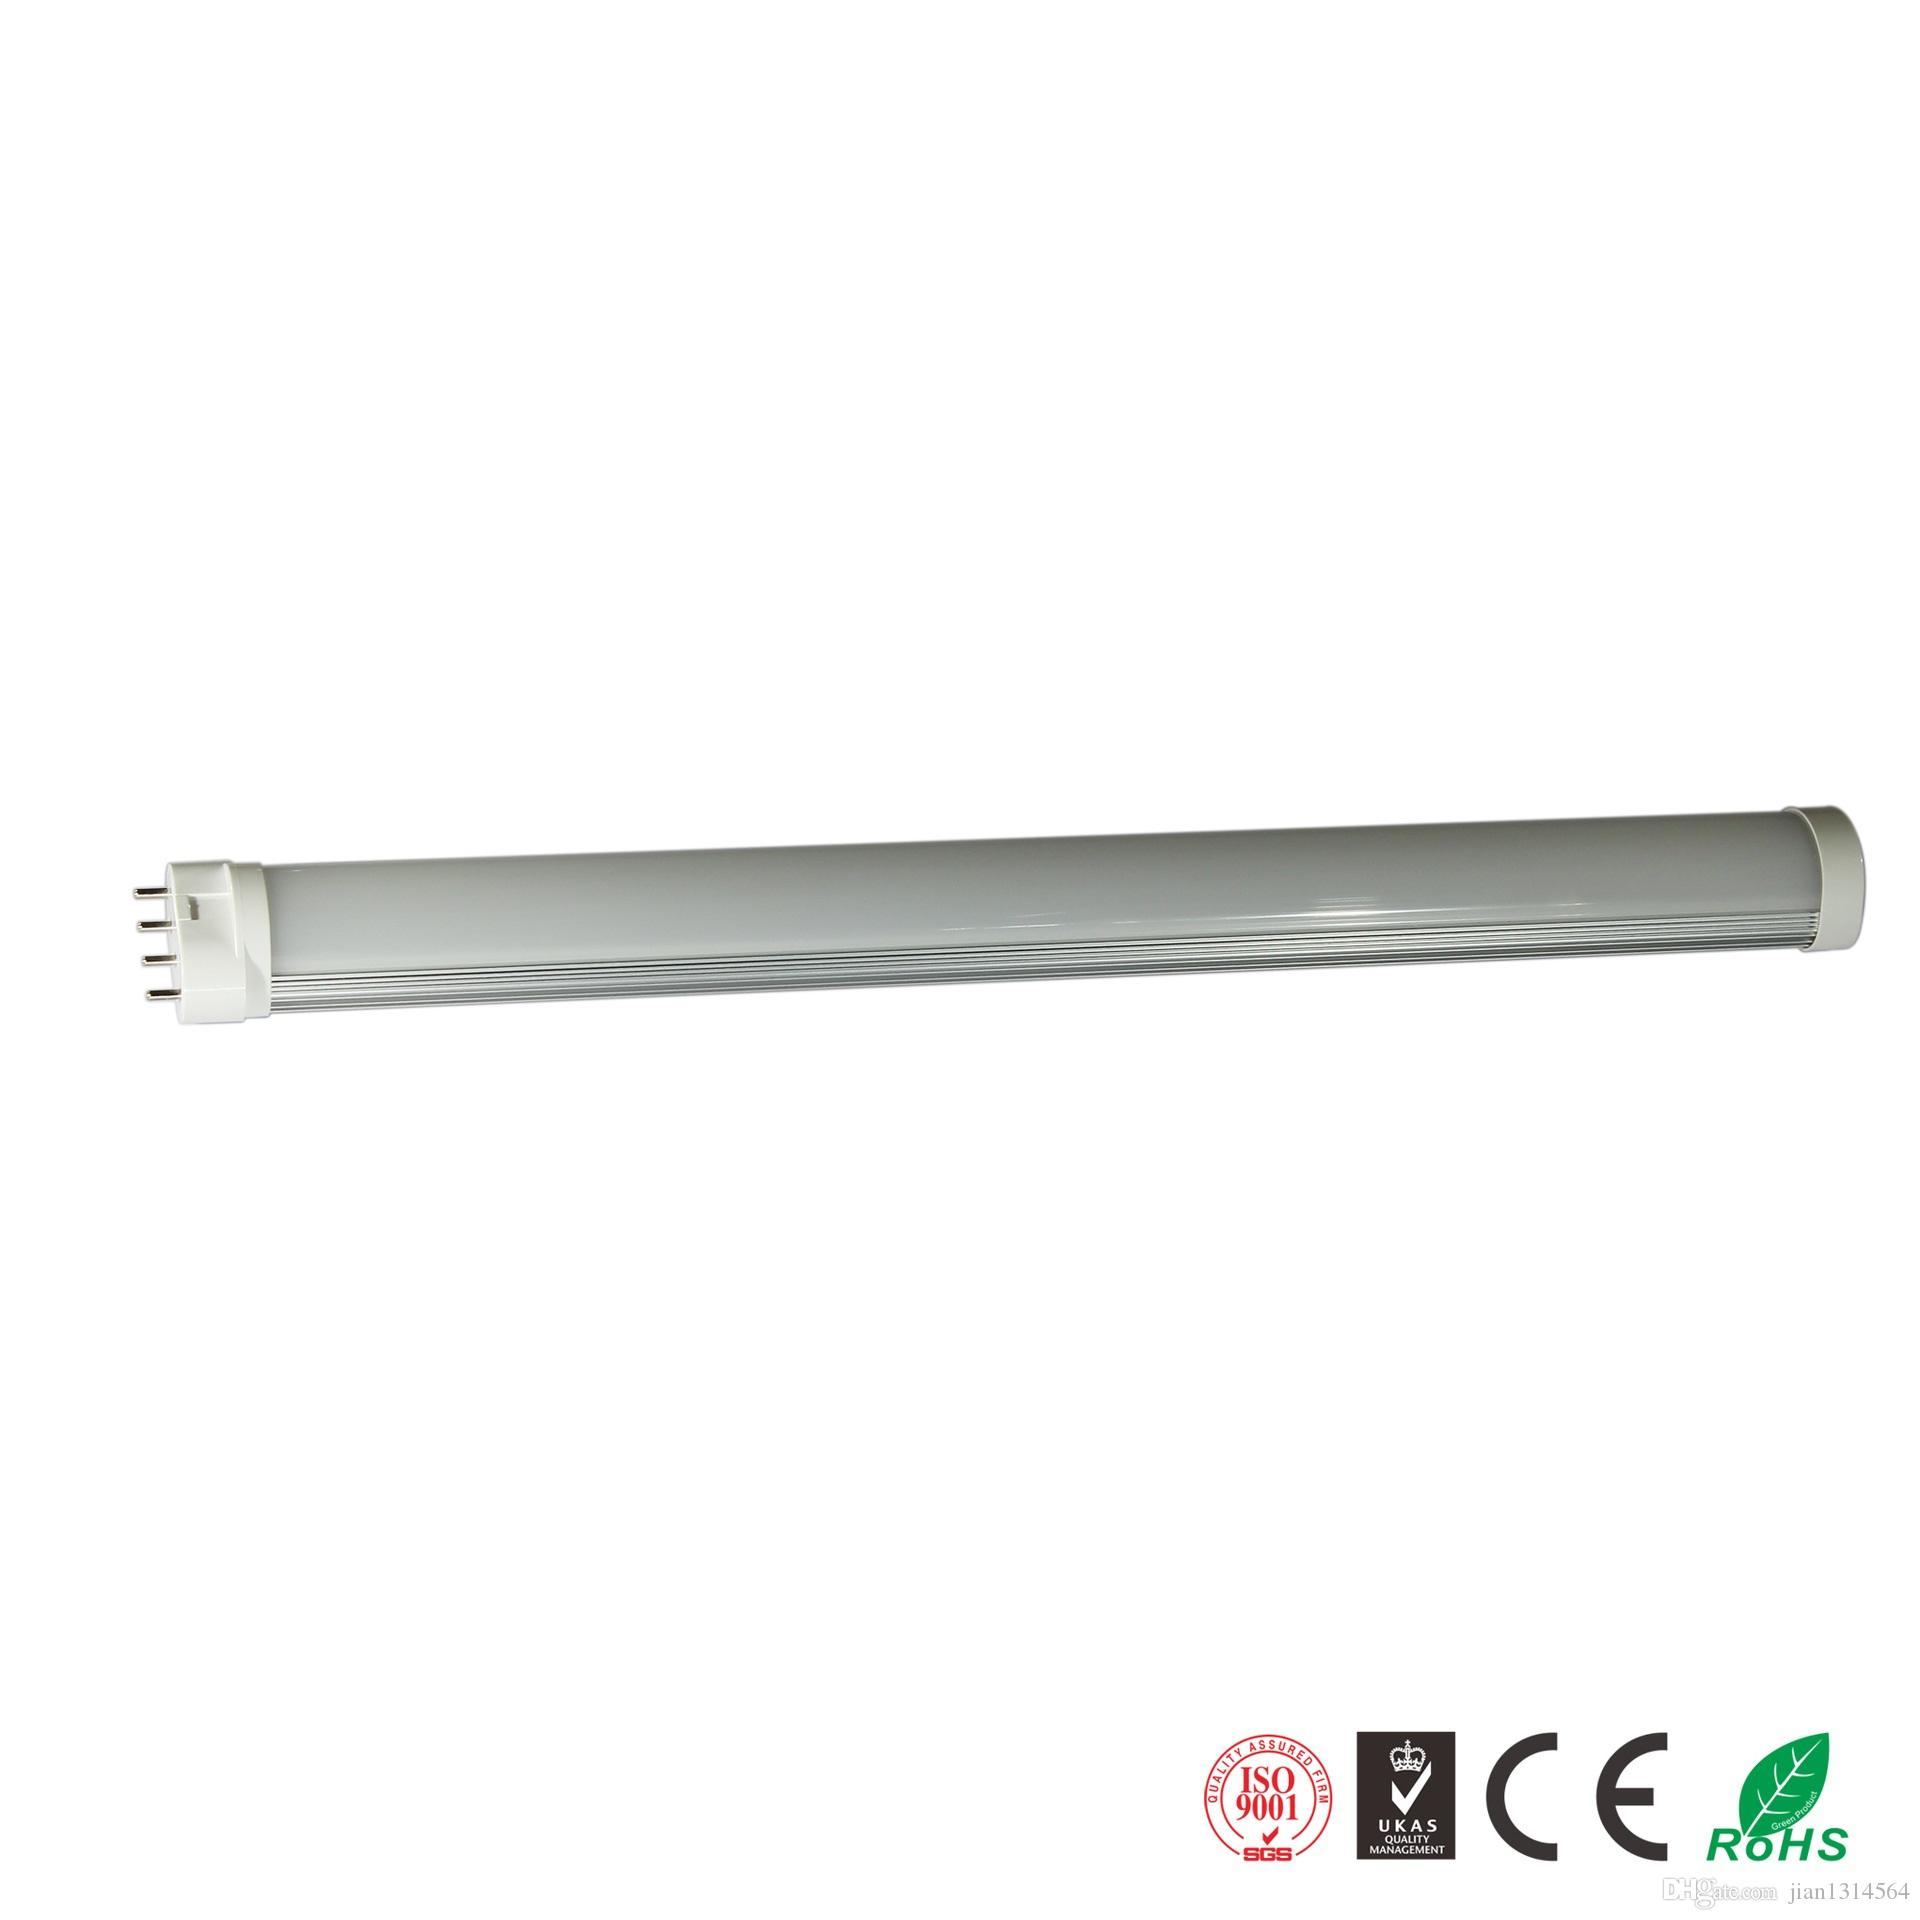 Tube Couverture 410mm 2g11 10pcs Lampe 18w Led Pl Transparente Ac85 Laiteuse Lot 265v 4pin CBtdsrQhox